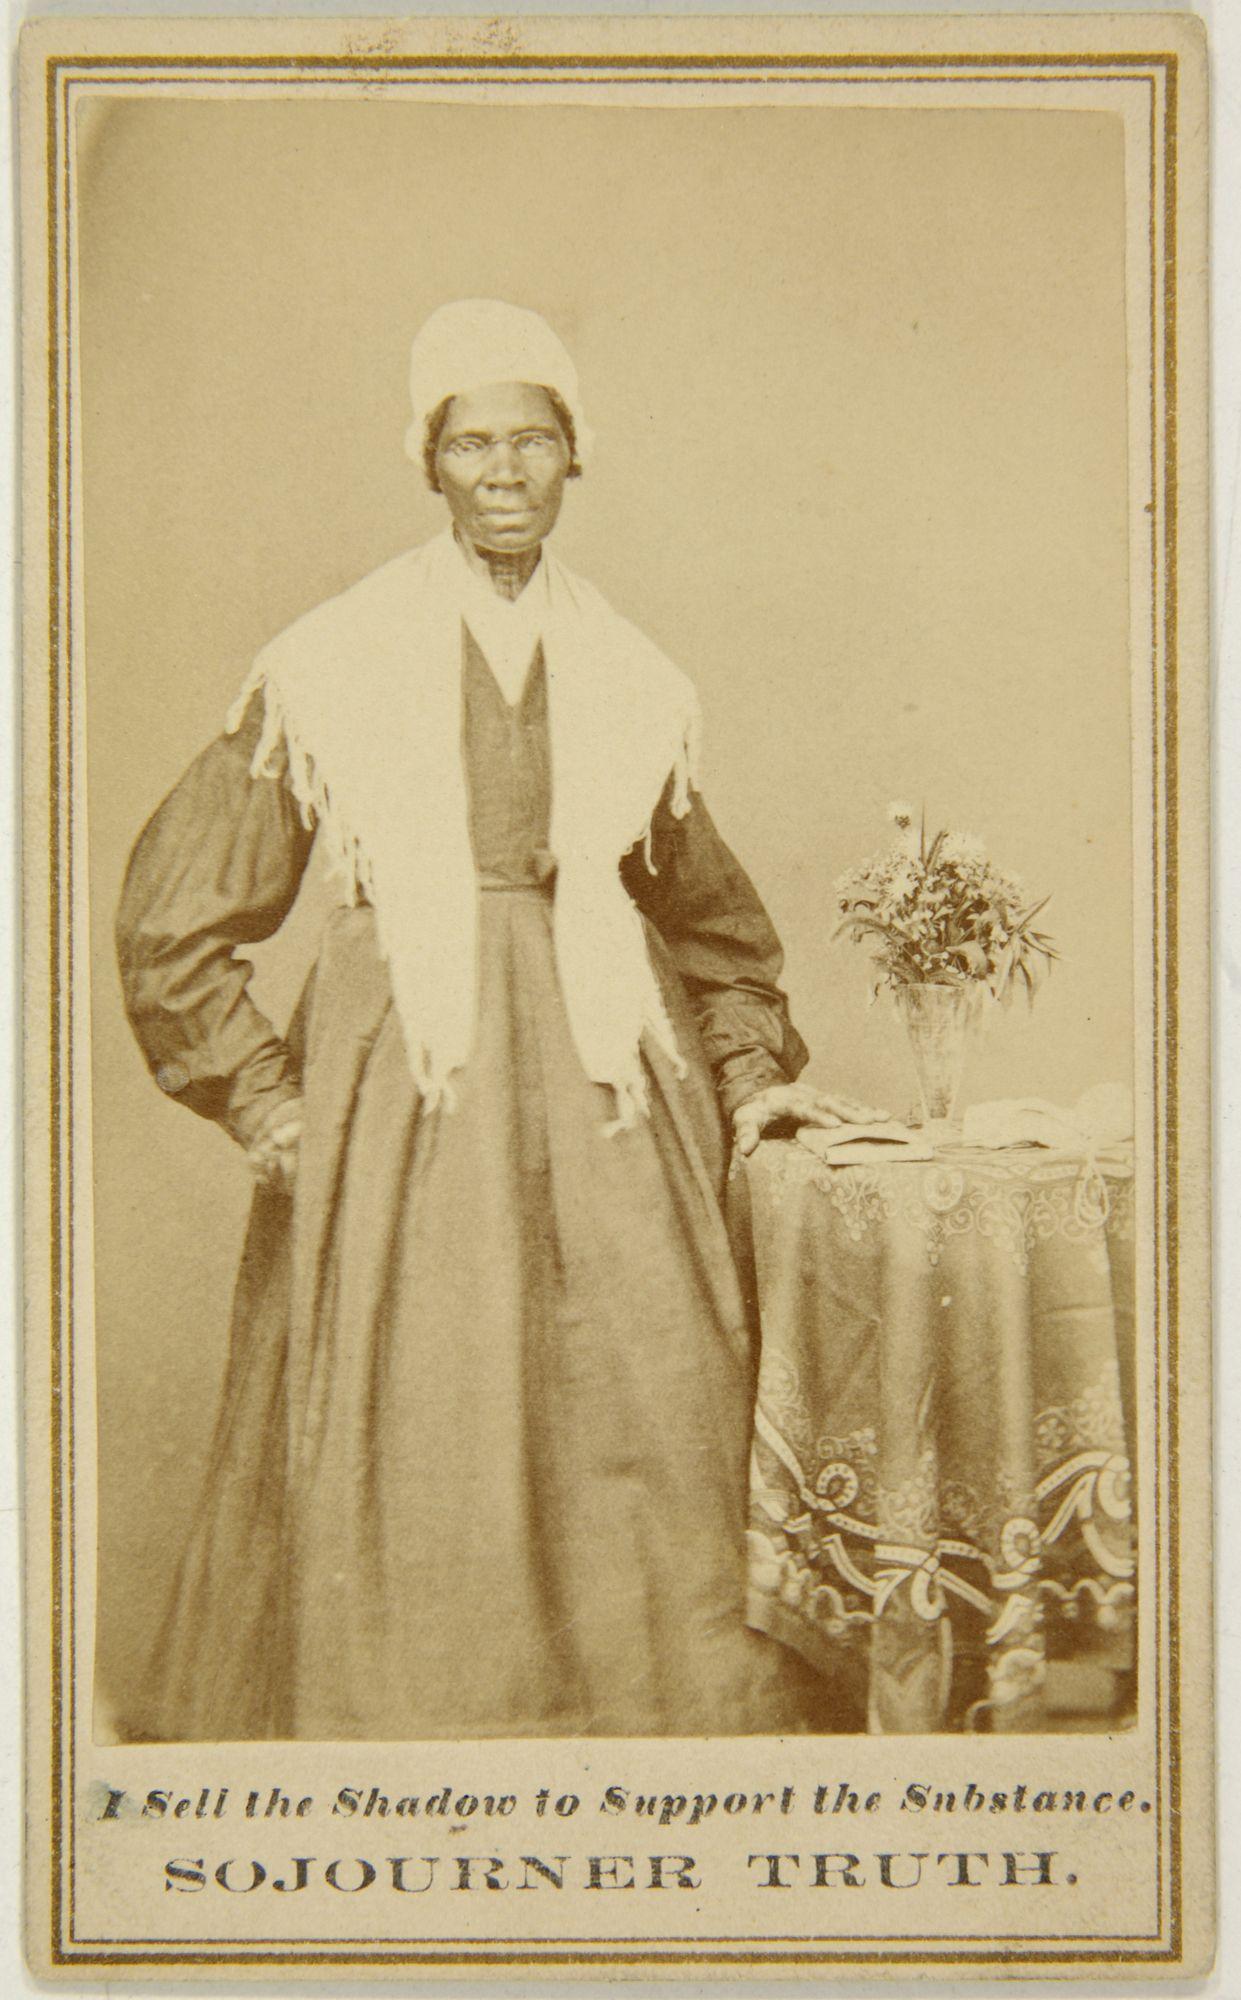 Caprioned Carte De Visite Of Sojourner Truth 1863 Albumen Print Mounted On Cardboard 4 X 2 1 In BAMPFA Gift Darcy Grimaldo Grigsby